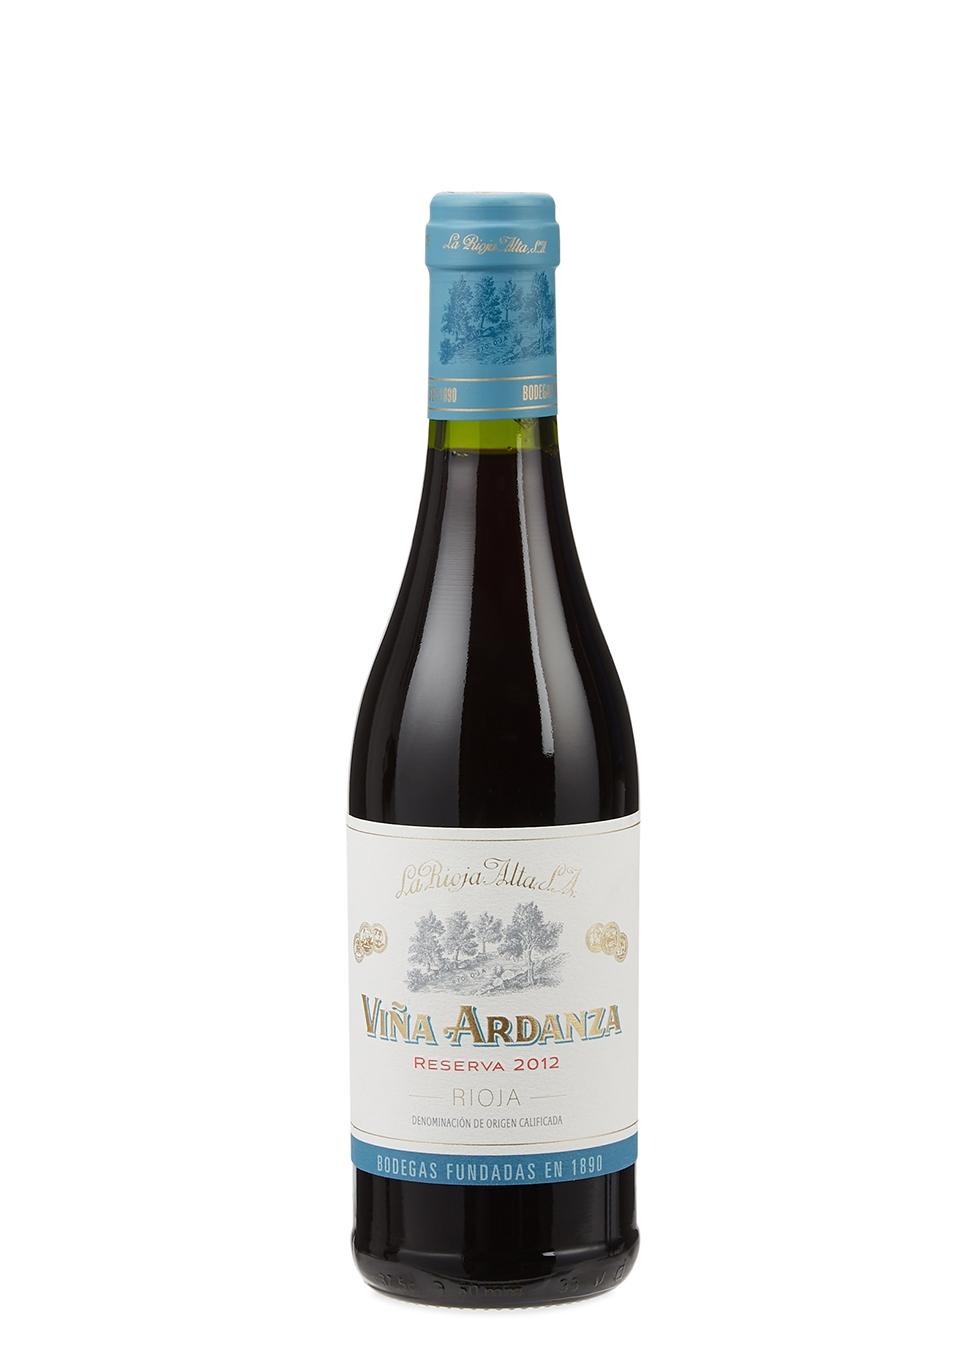 Viña Ardanza Rioja Reserva 2012 Half Bottle 375ml